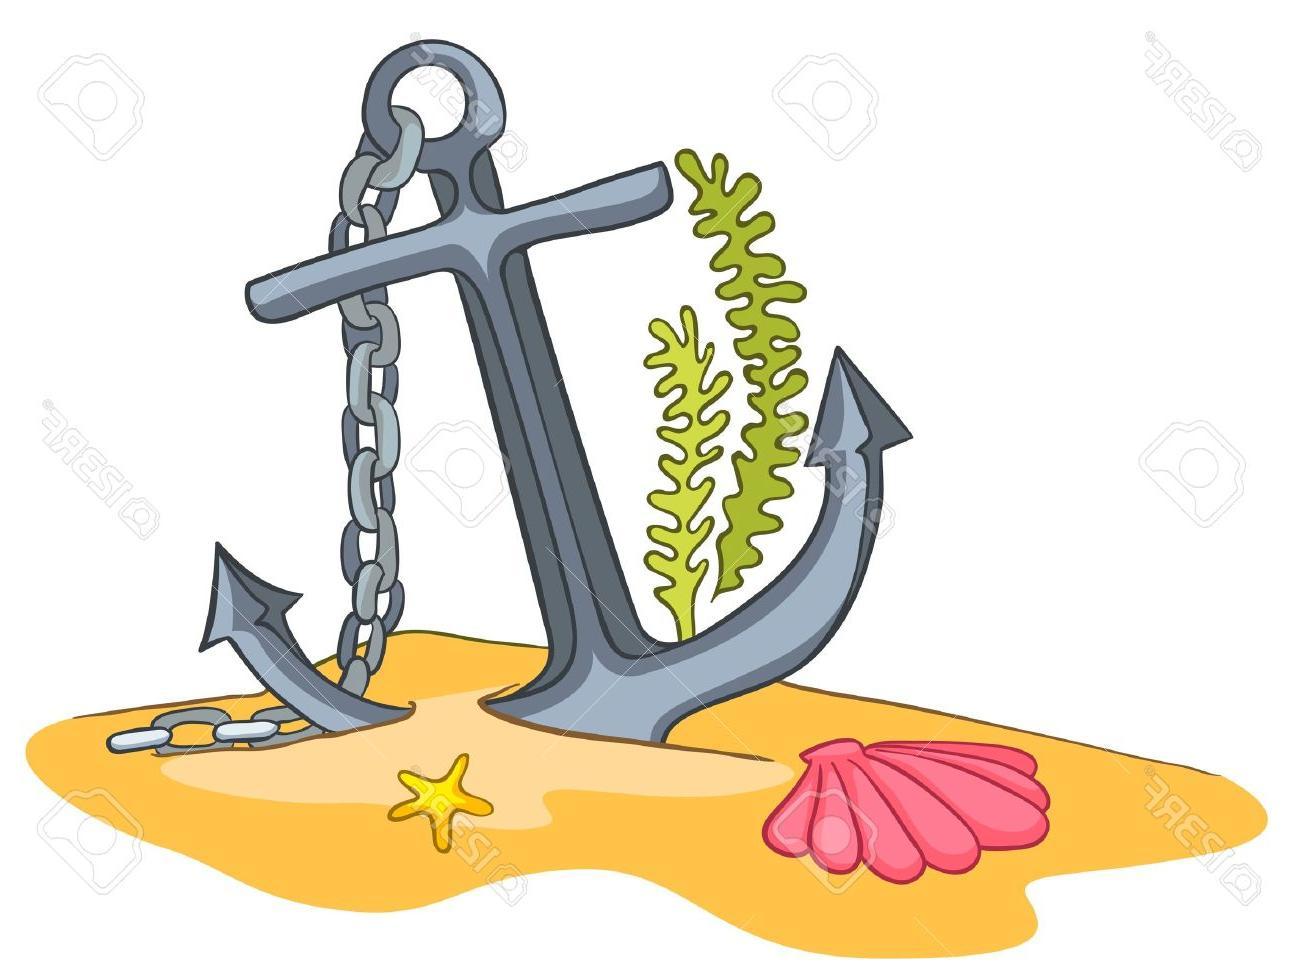 Clipart anchor underwater. Unique cartoon design vector